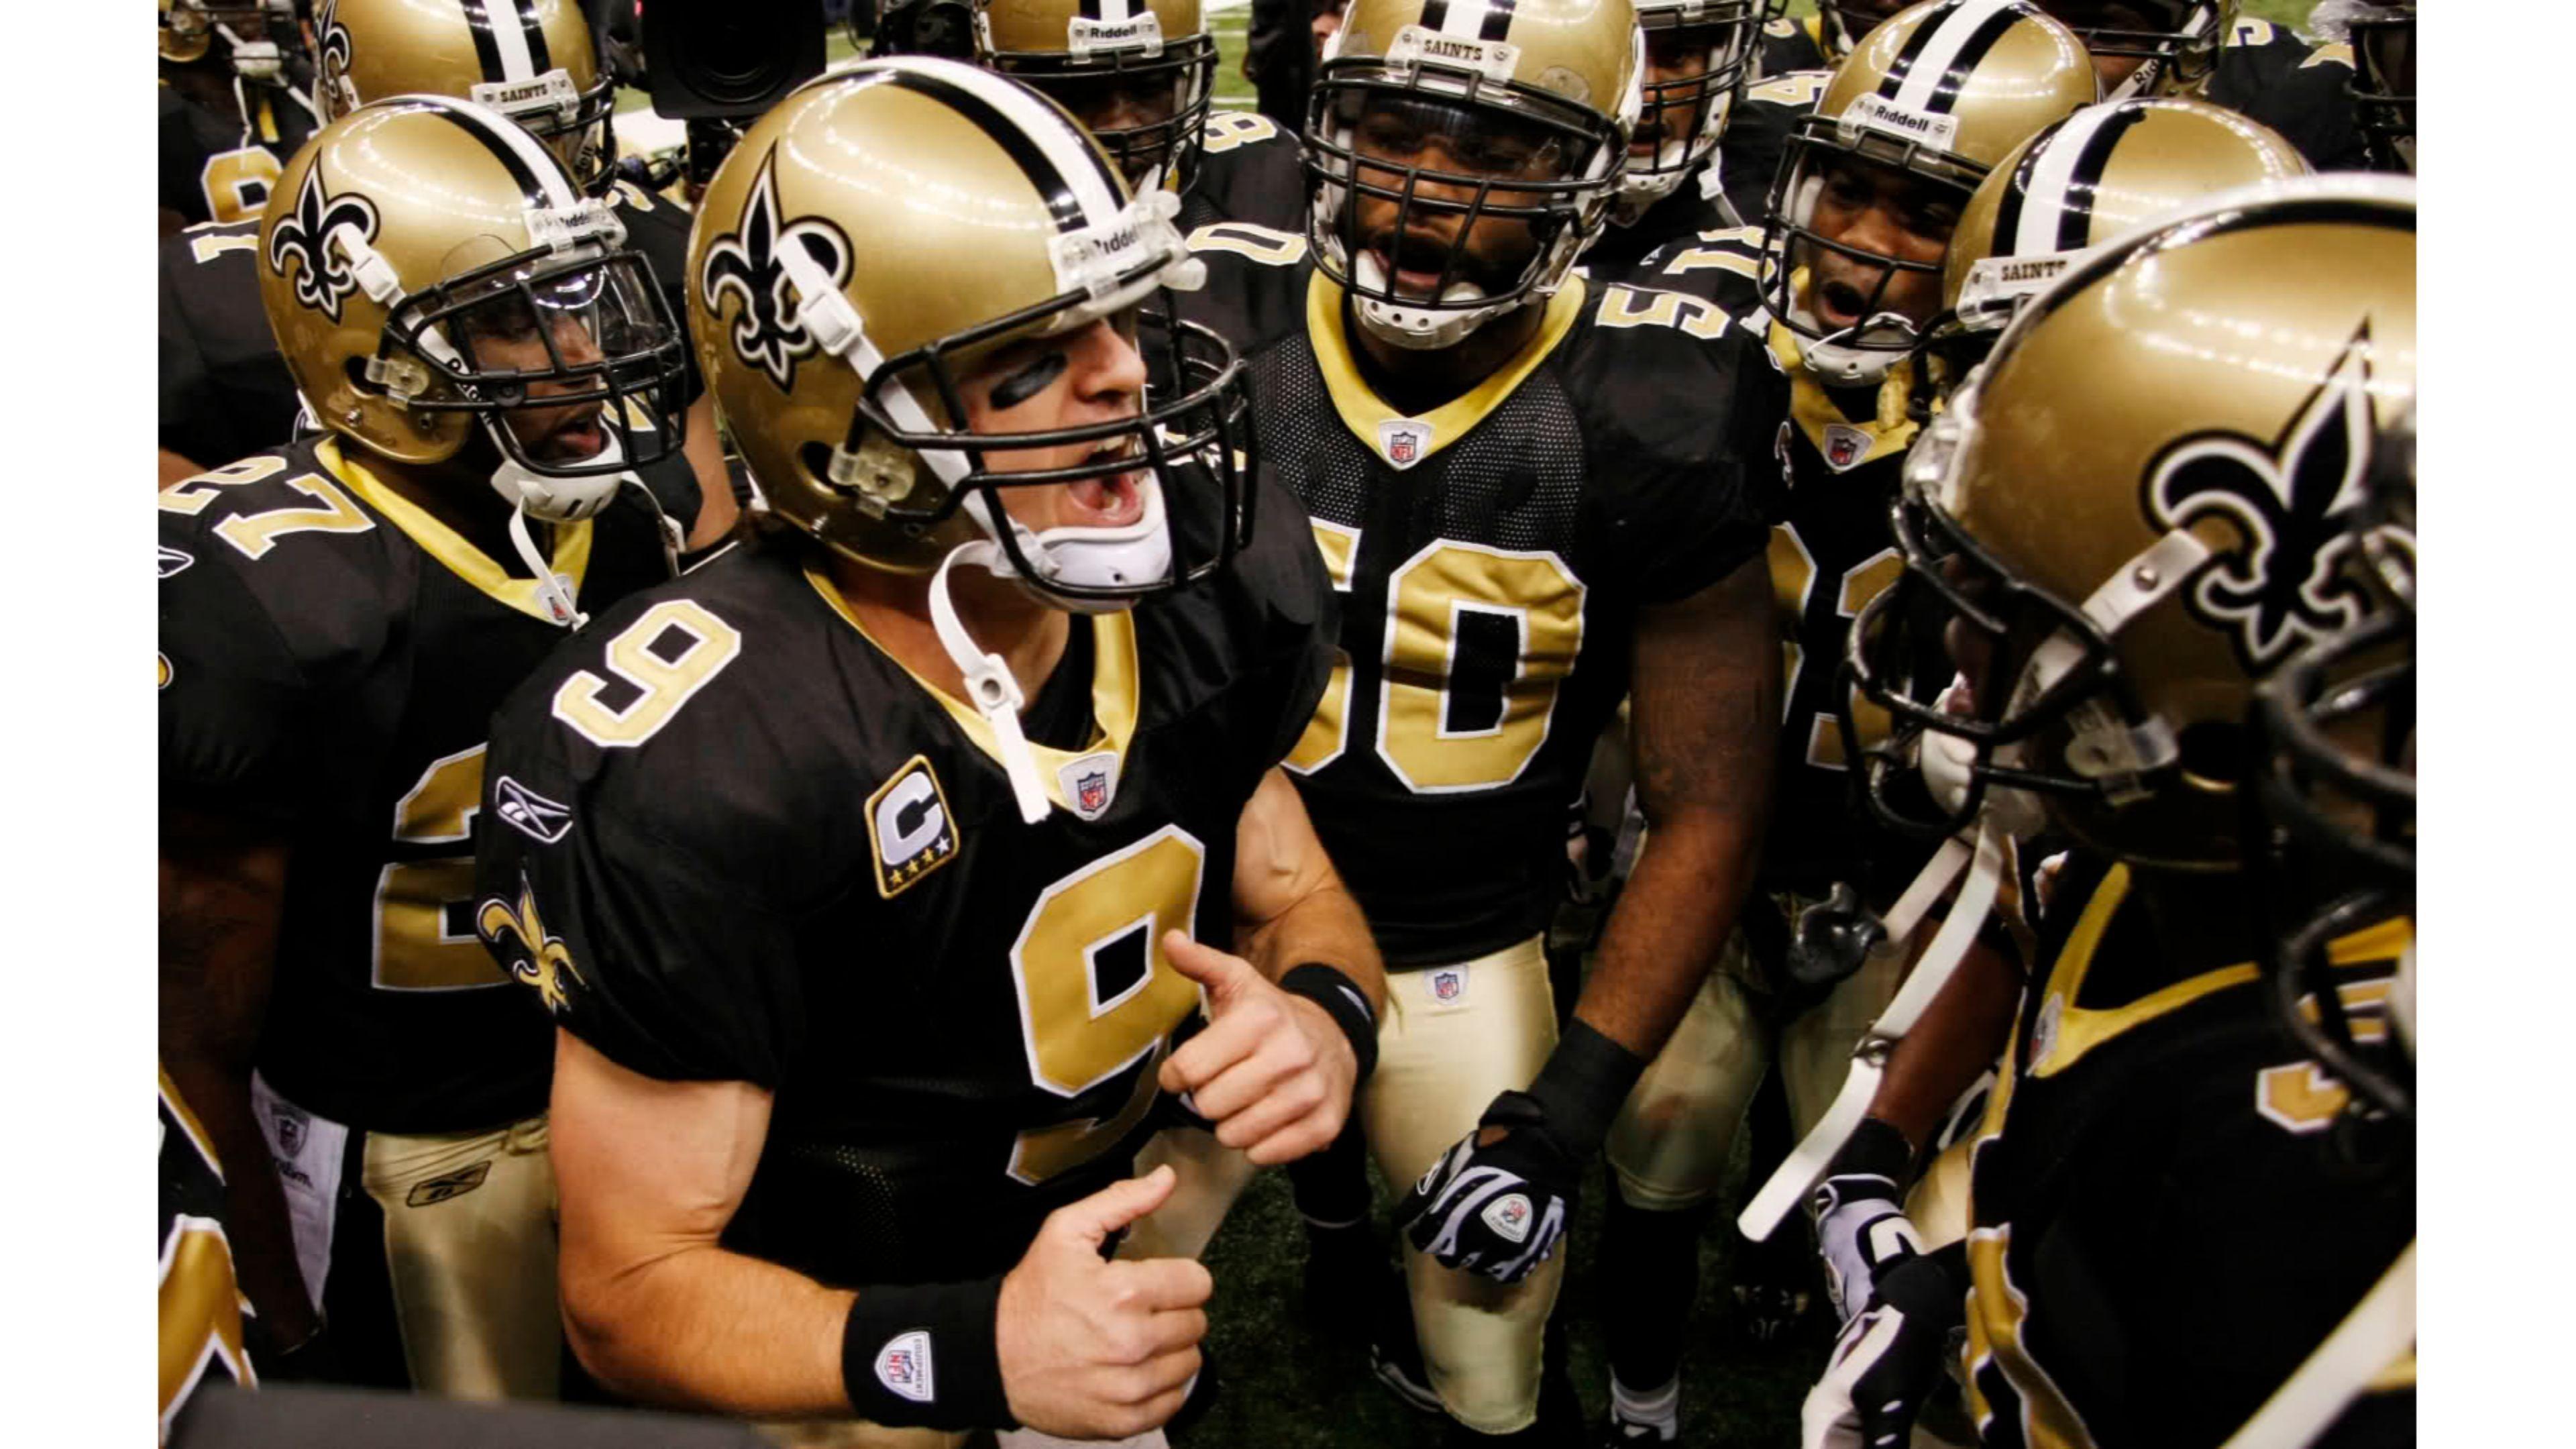 Saints Team 4K Drew Brees Wallpaper